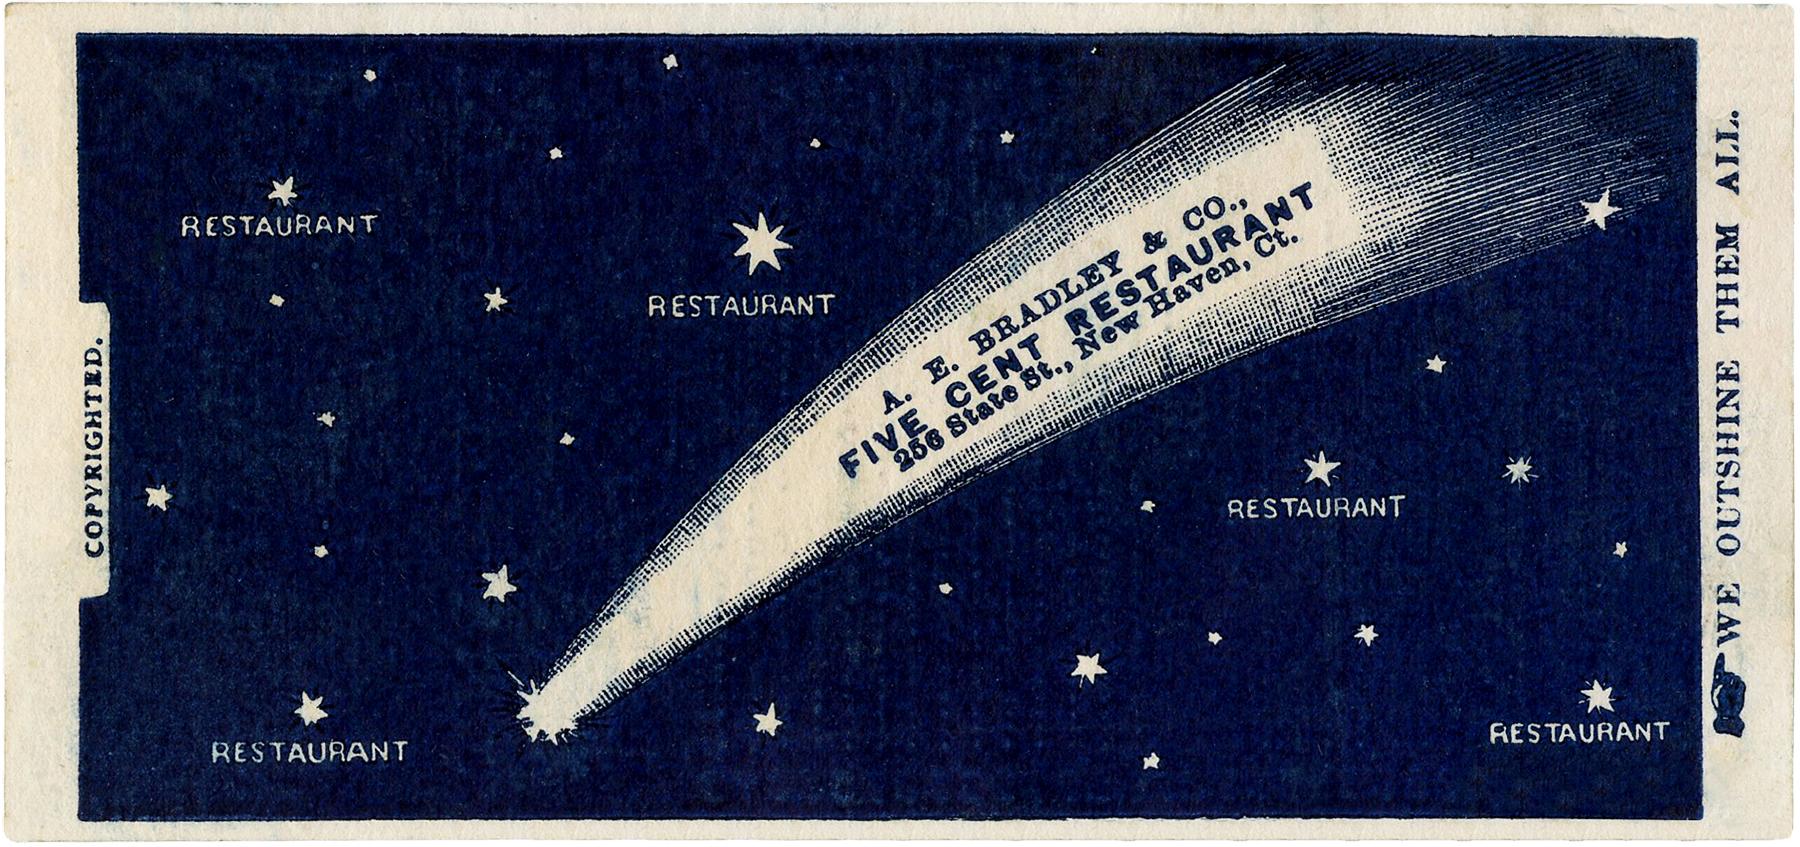 Vintage Restaurant Ad Image